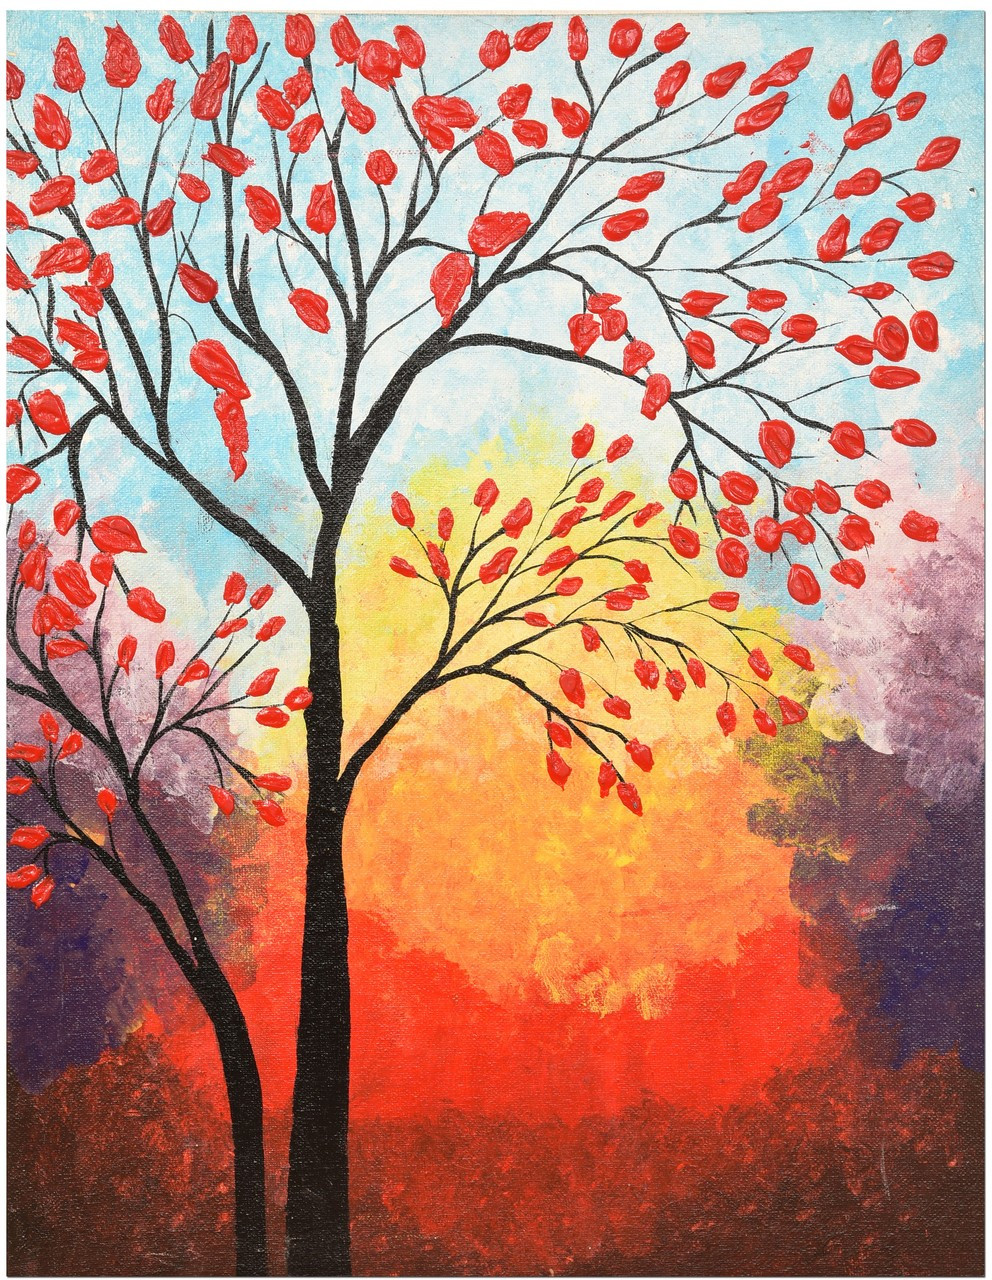 red tree art 3384